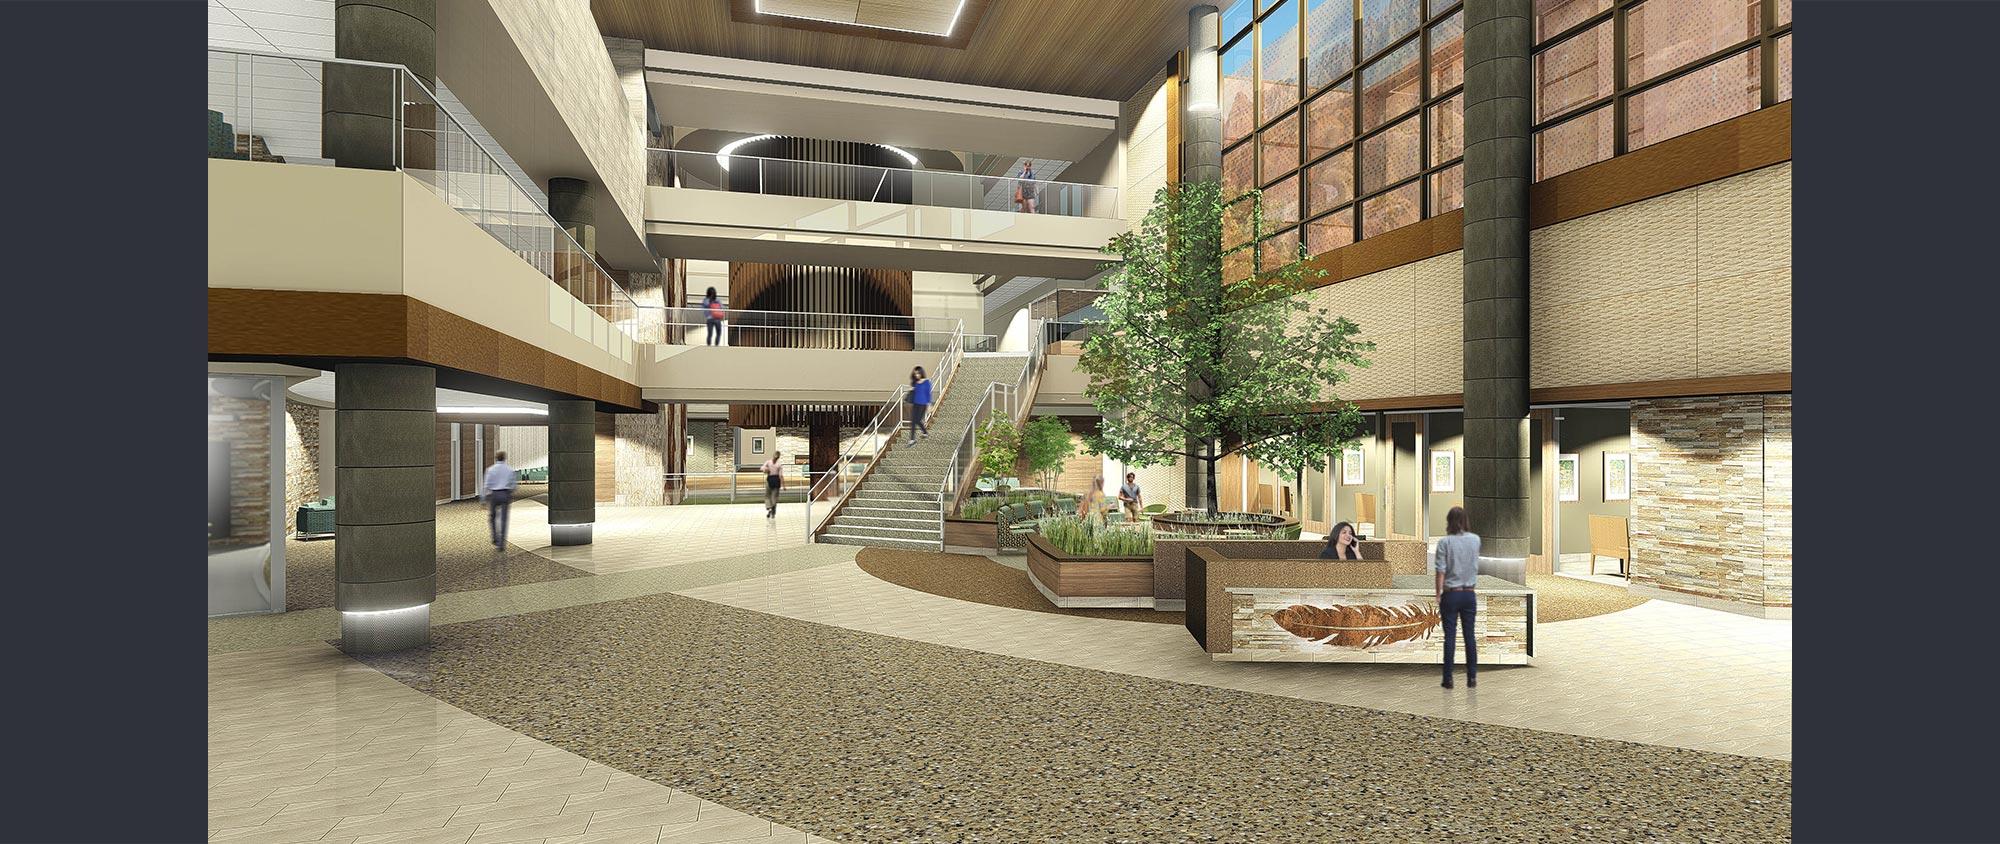 Regional Health Rapid City Regional Hospital